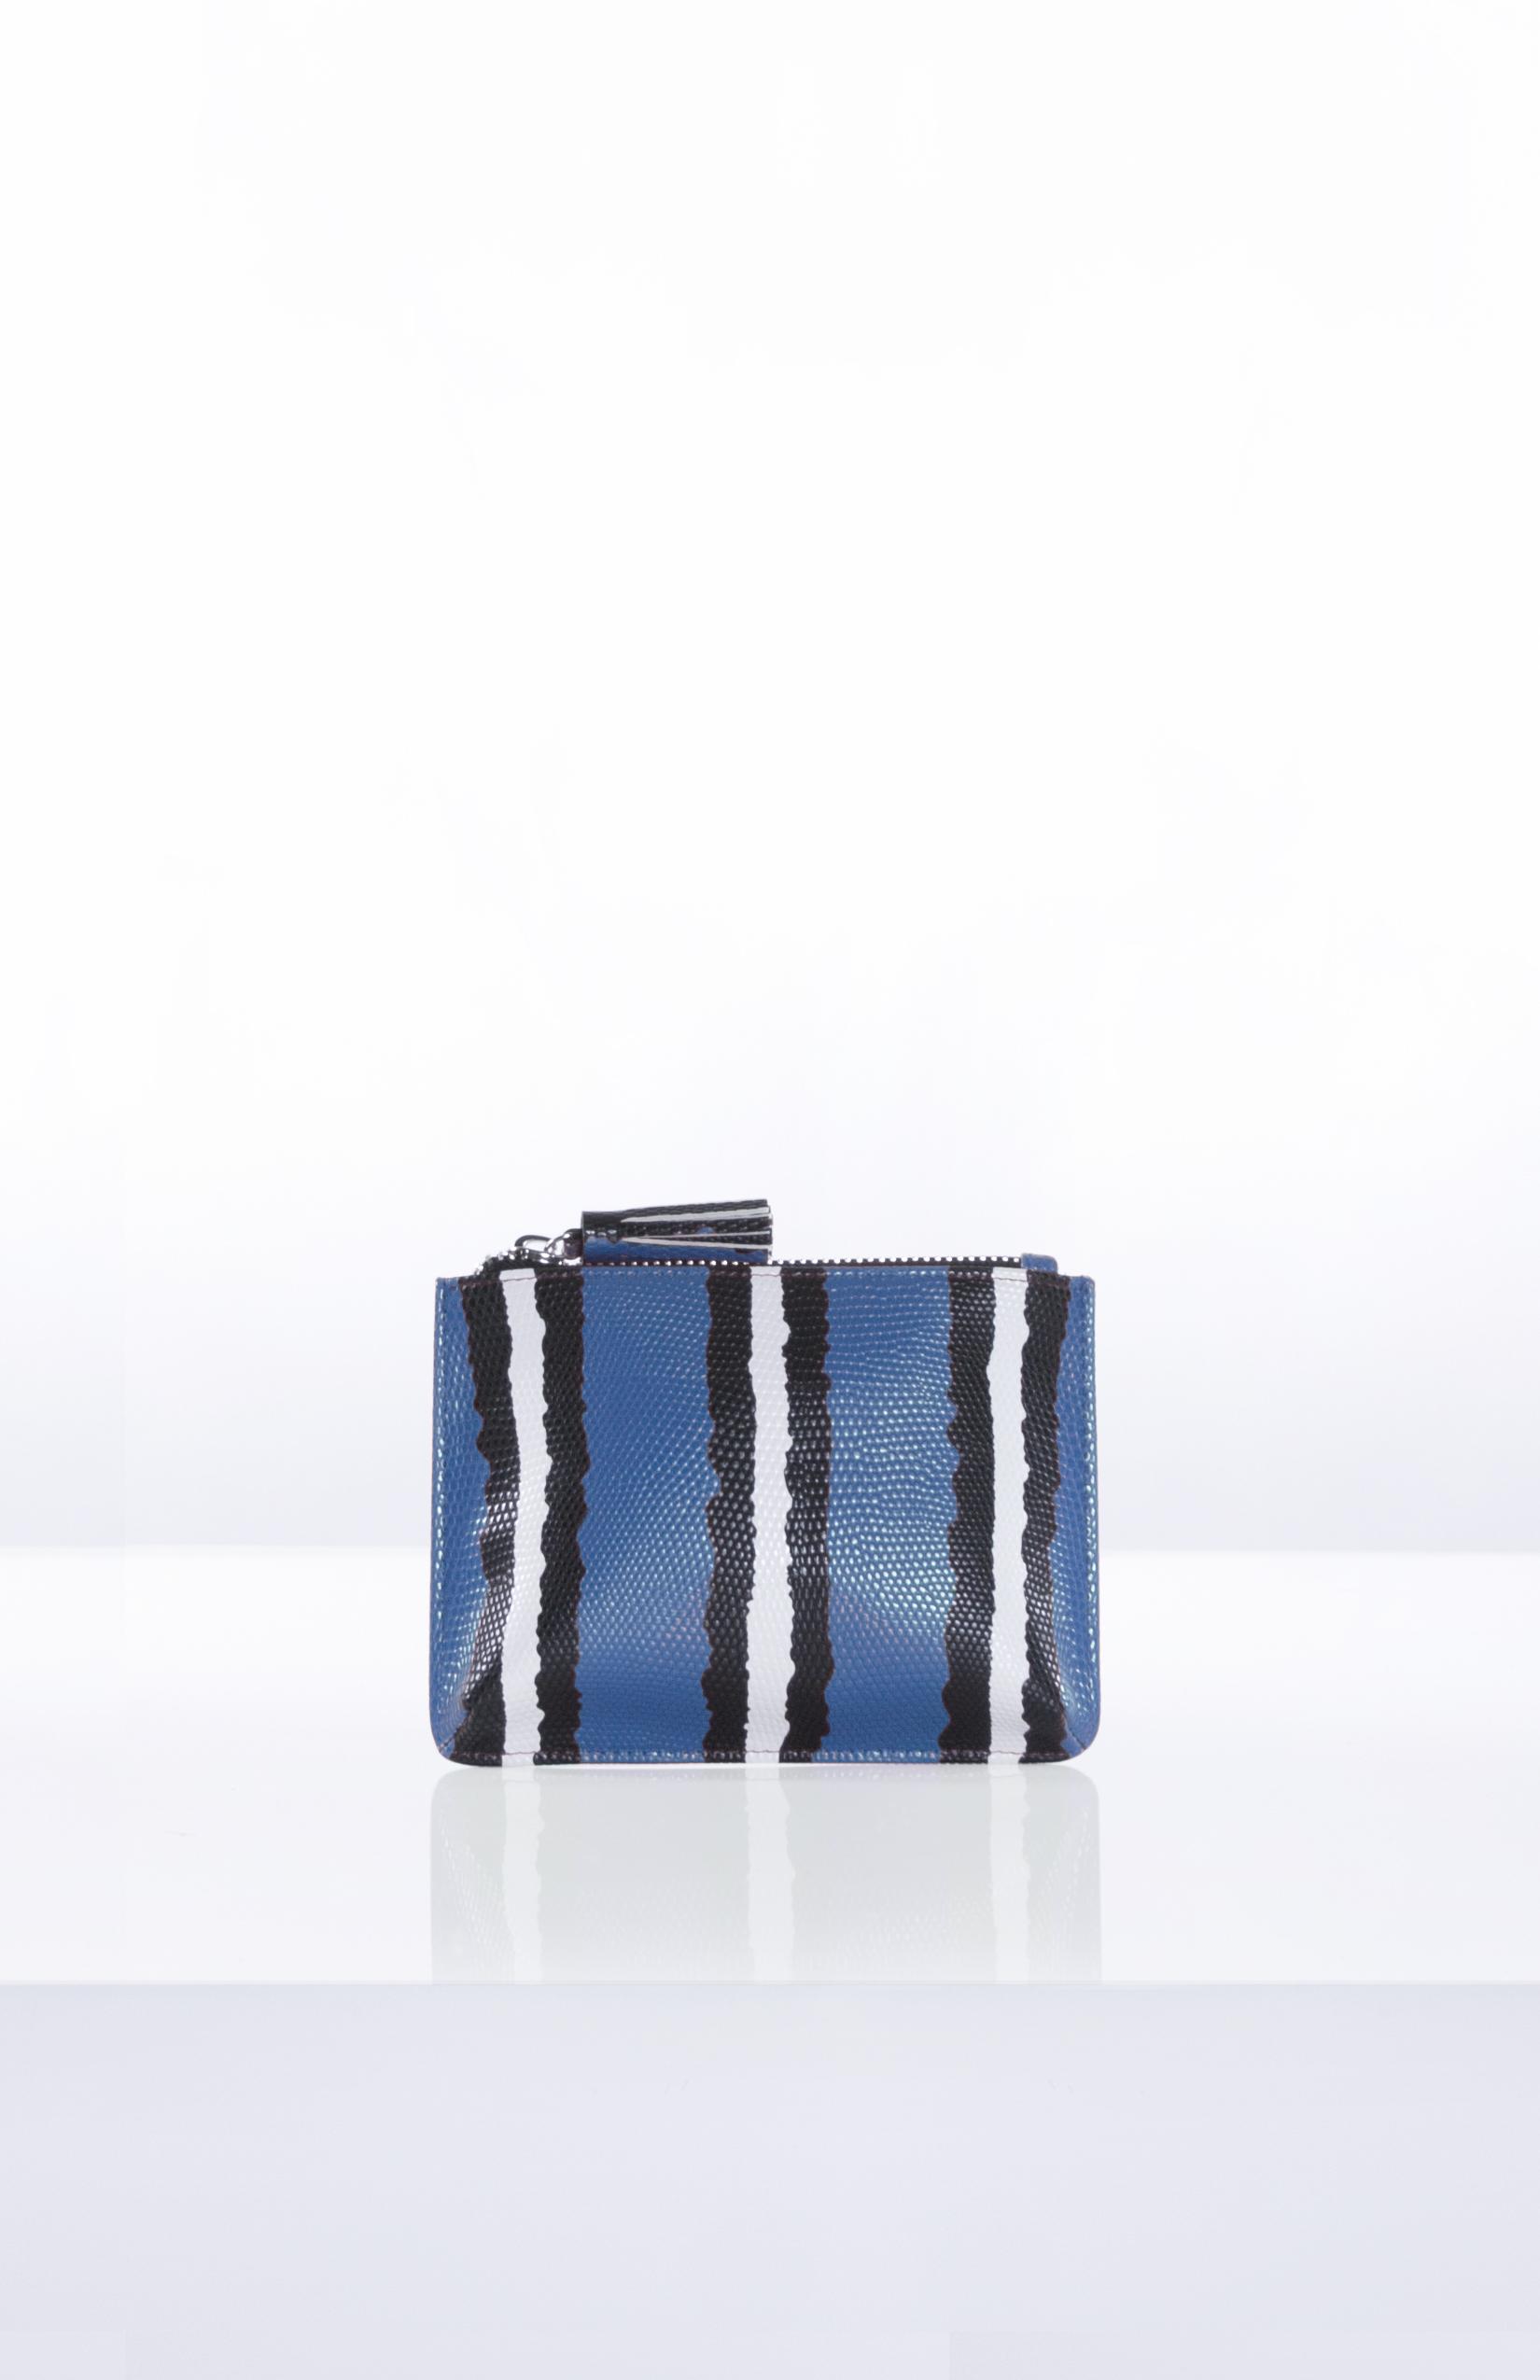 ADELE SNAKE POUCH- Blue